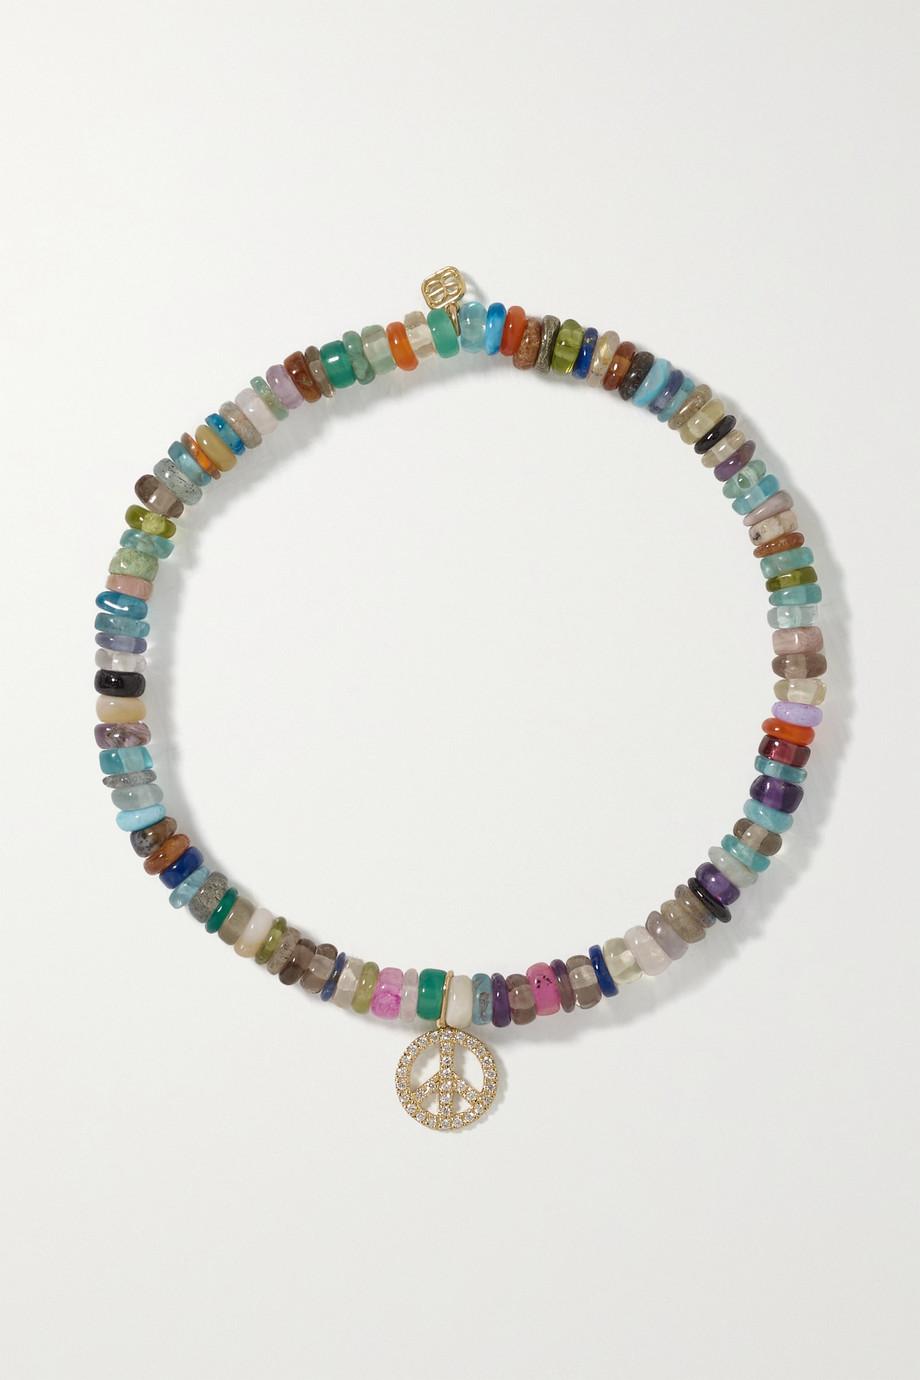 Sydney Evan Mini Peace Sign 14-karat gold, diamond and bead bracelet